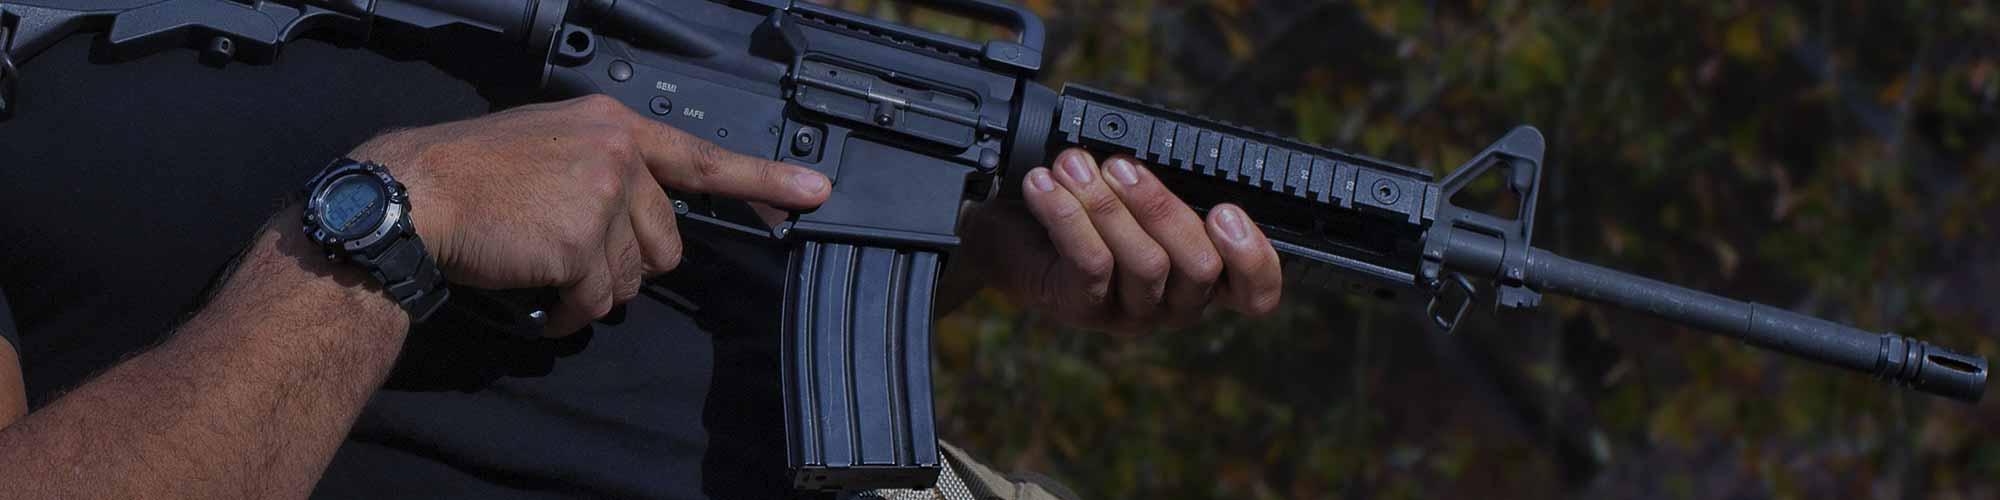 Save on AR-15 rifles